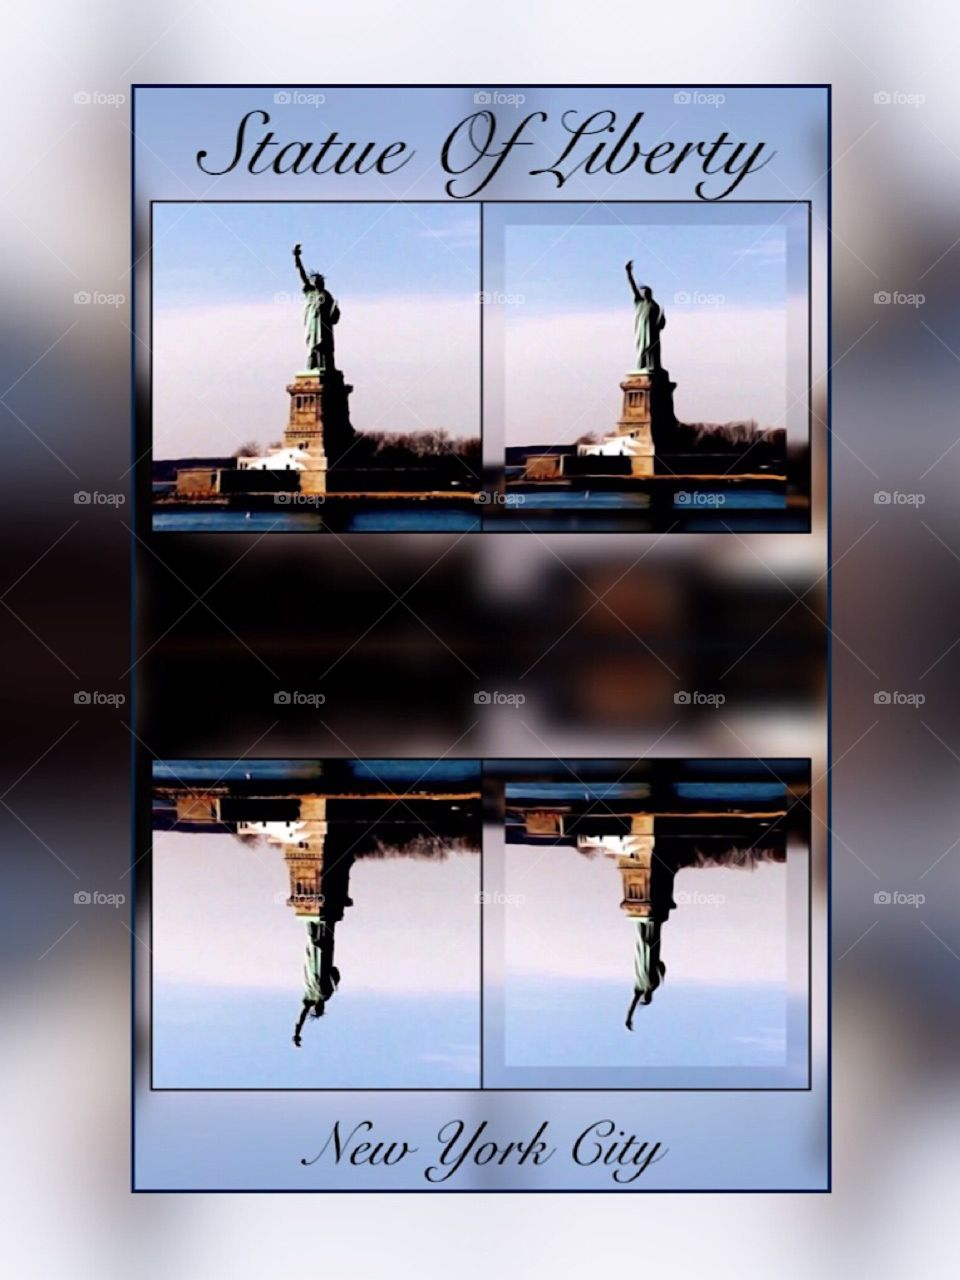 Statue Of Liberty -New York City